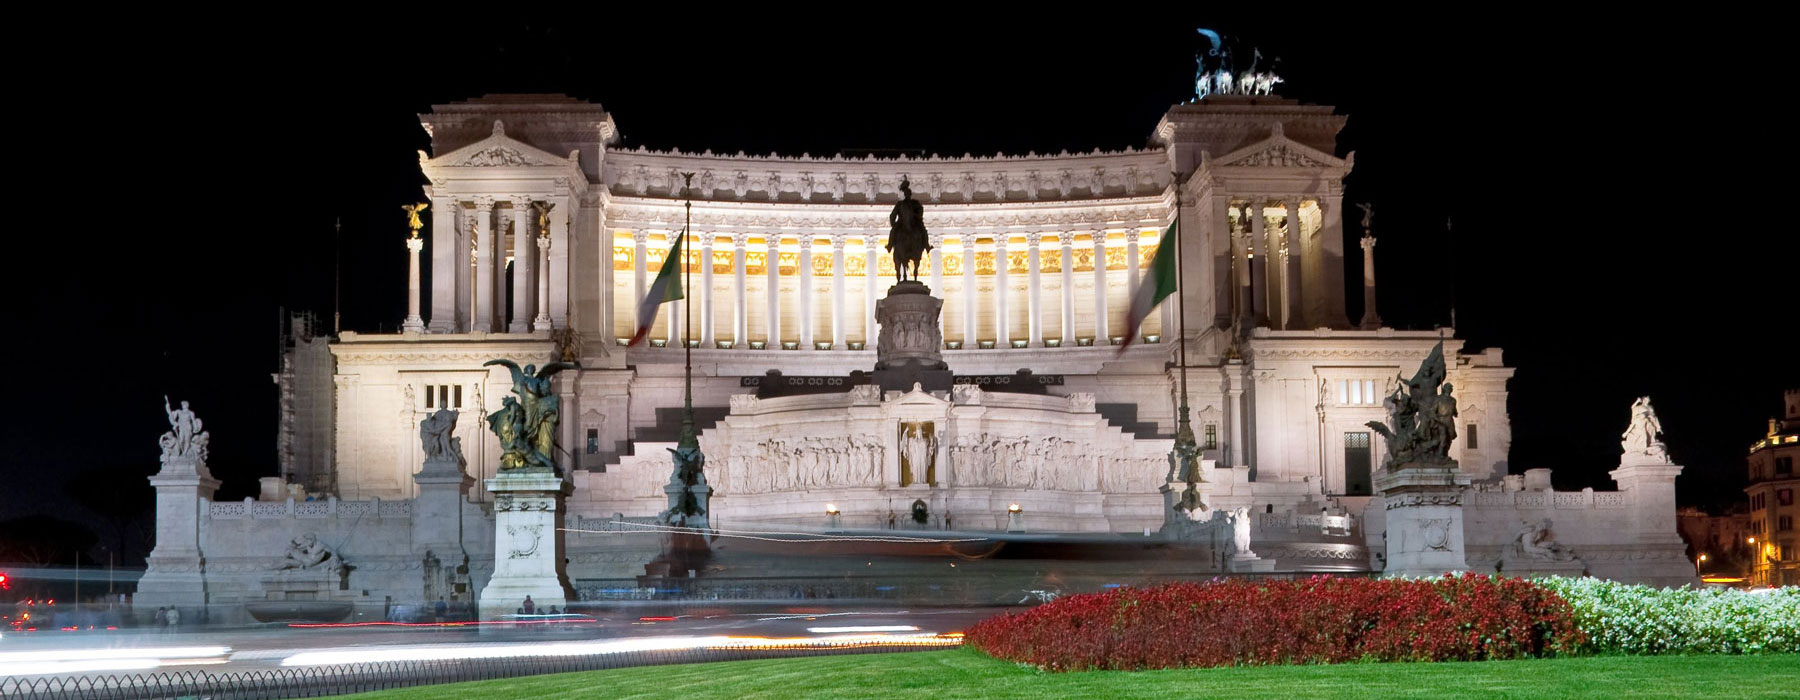 Roma_10.jpg